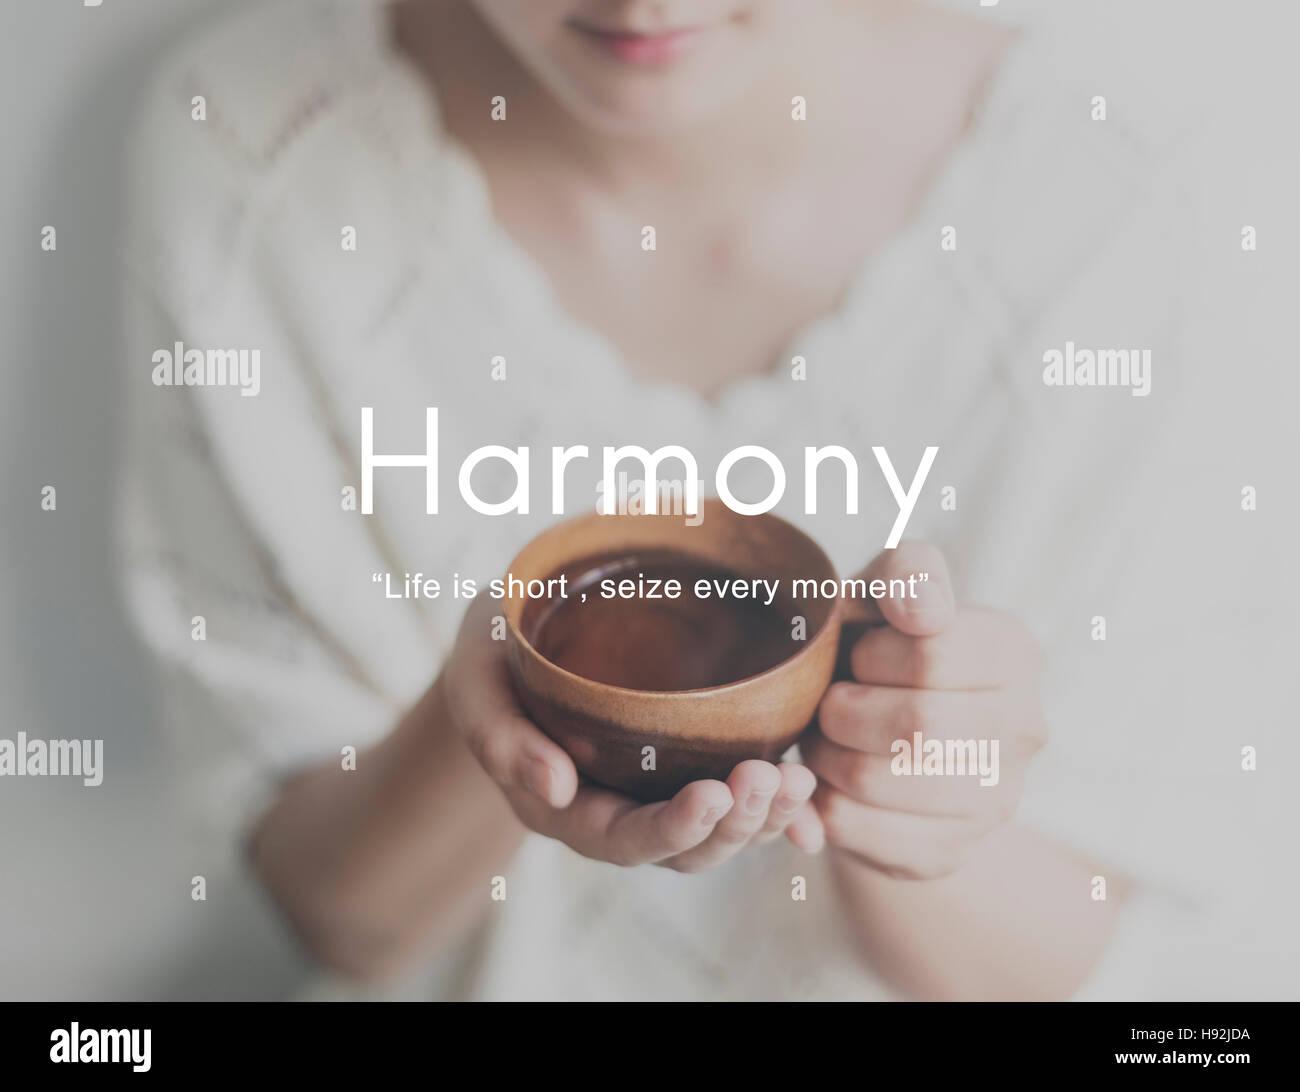 Harmony Happiness Activity Life Concept - Stock Image